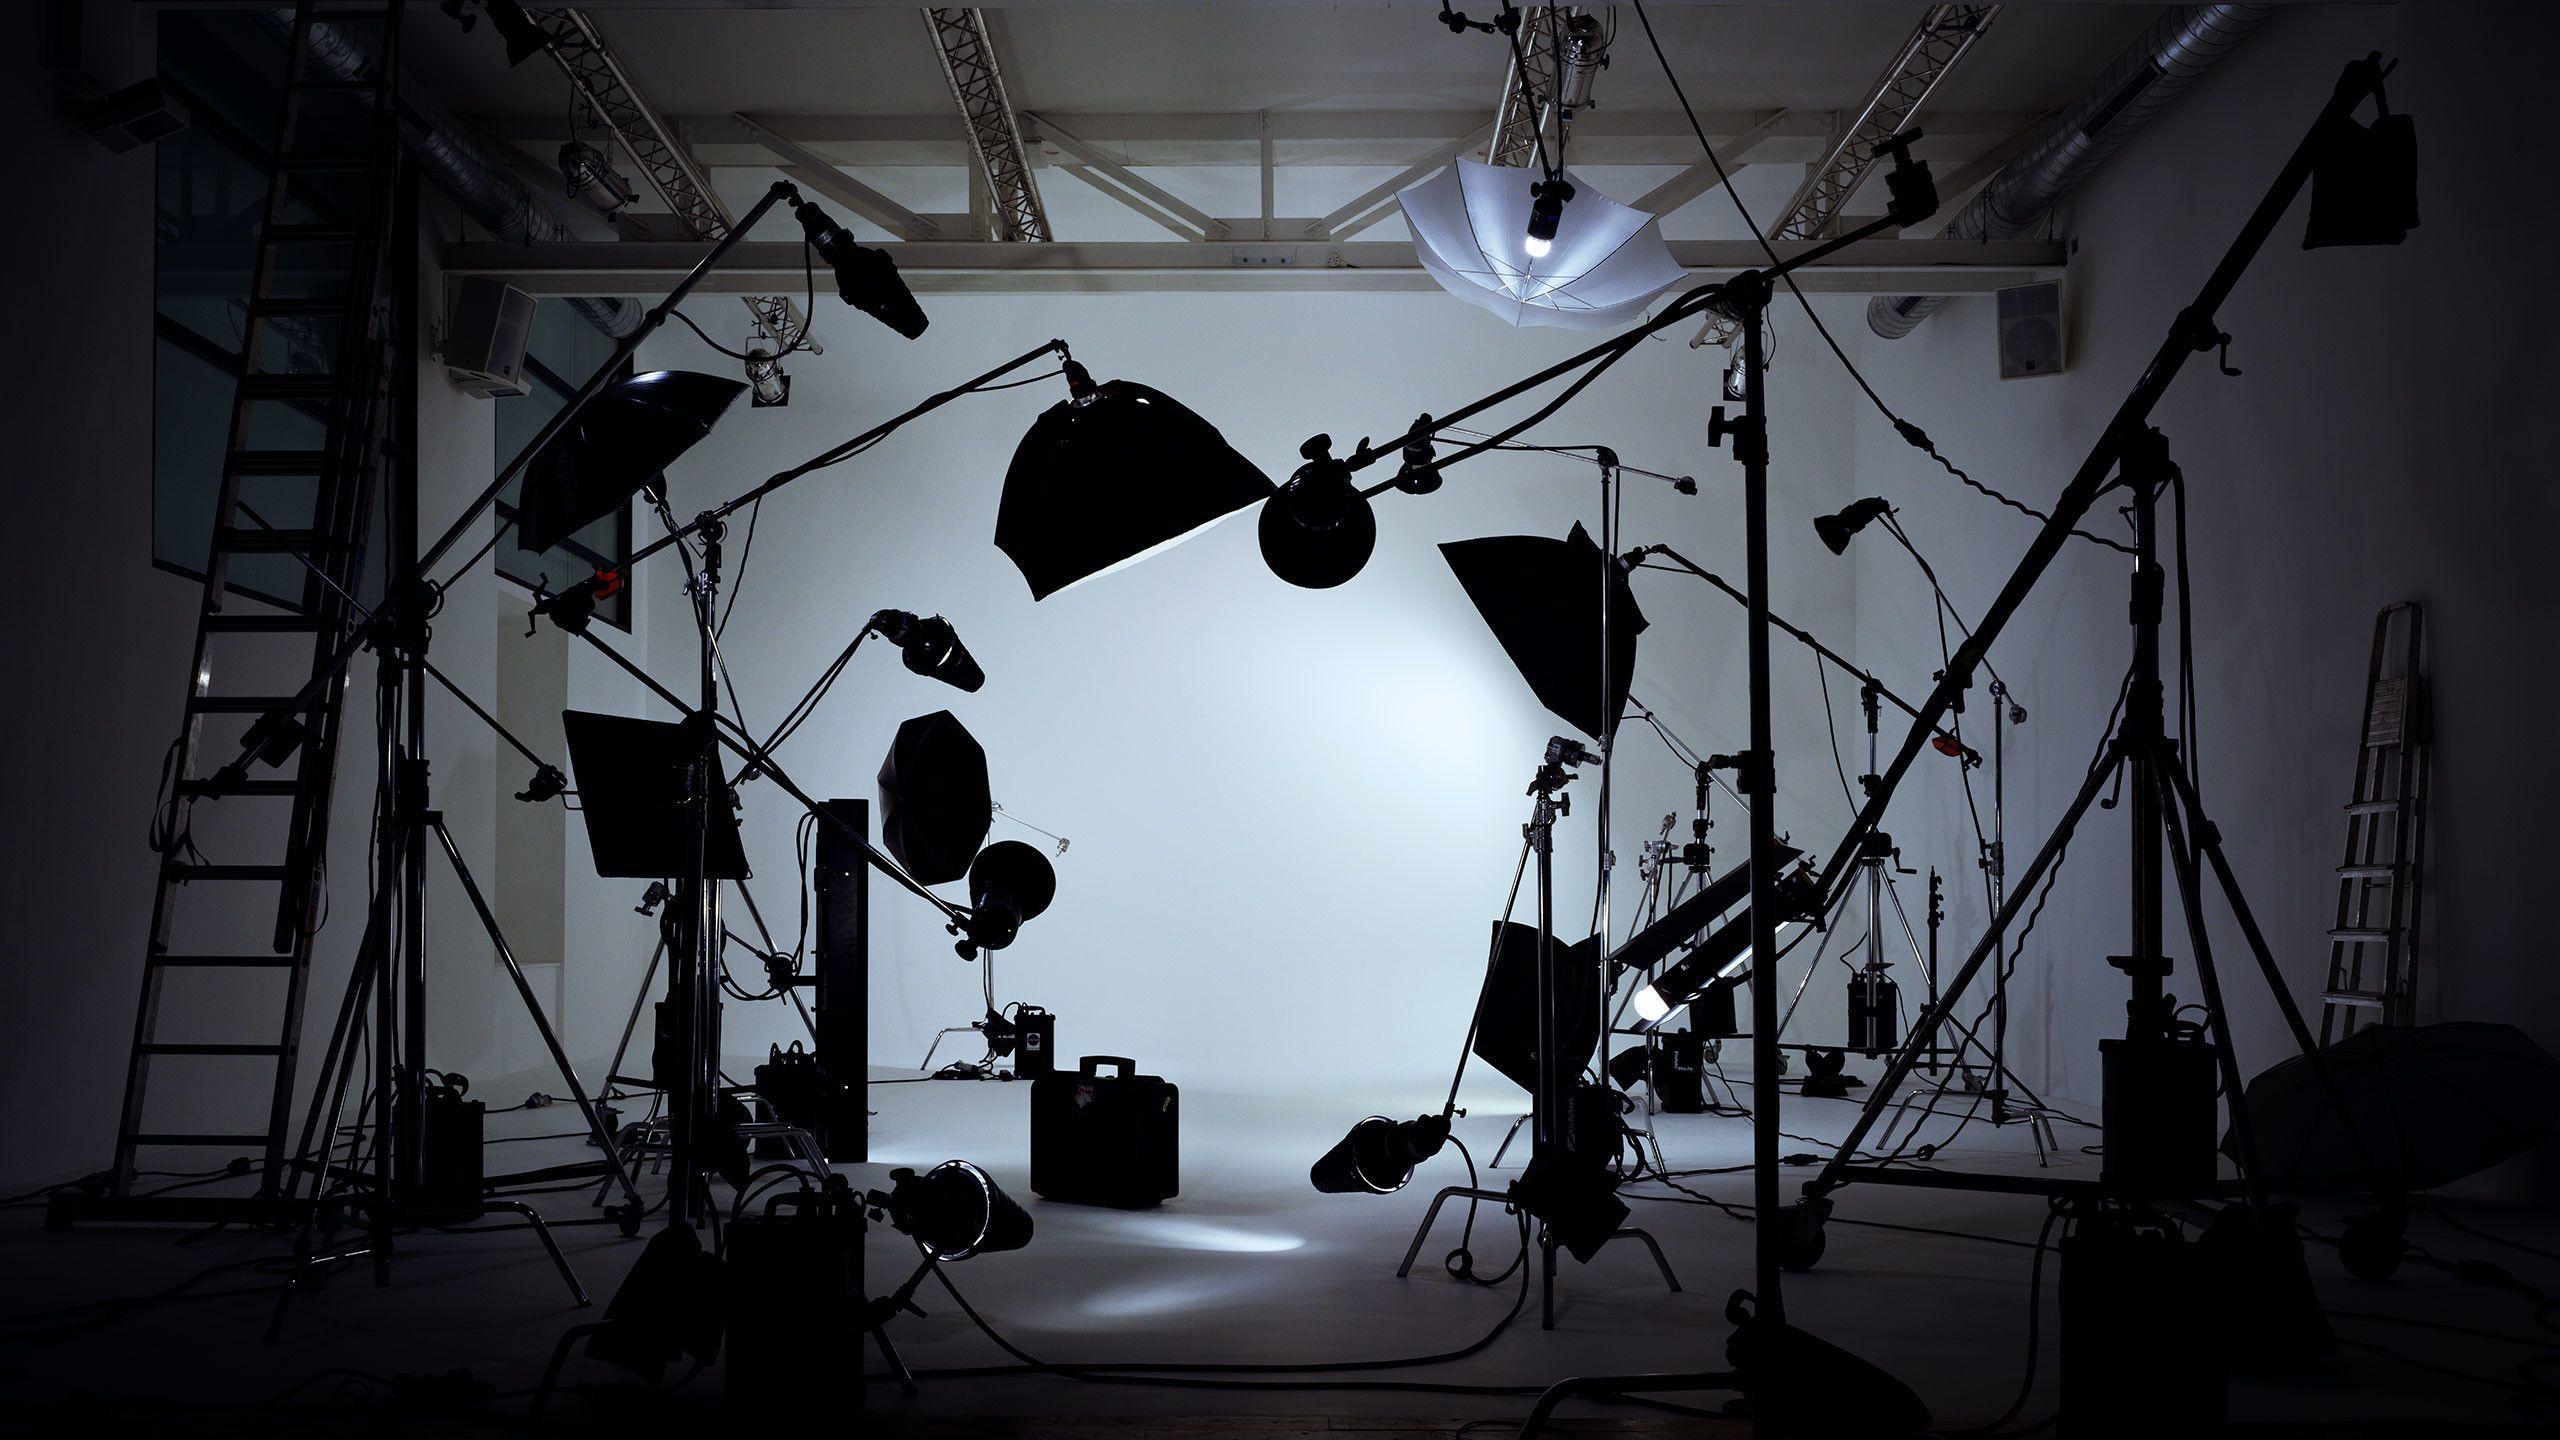 Film Studio Wallpapers Top Free Film Studio Backgrounds Wallpaperaccess